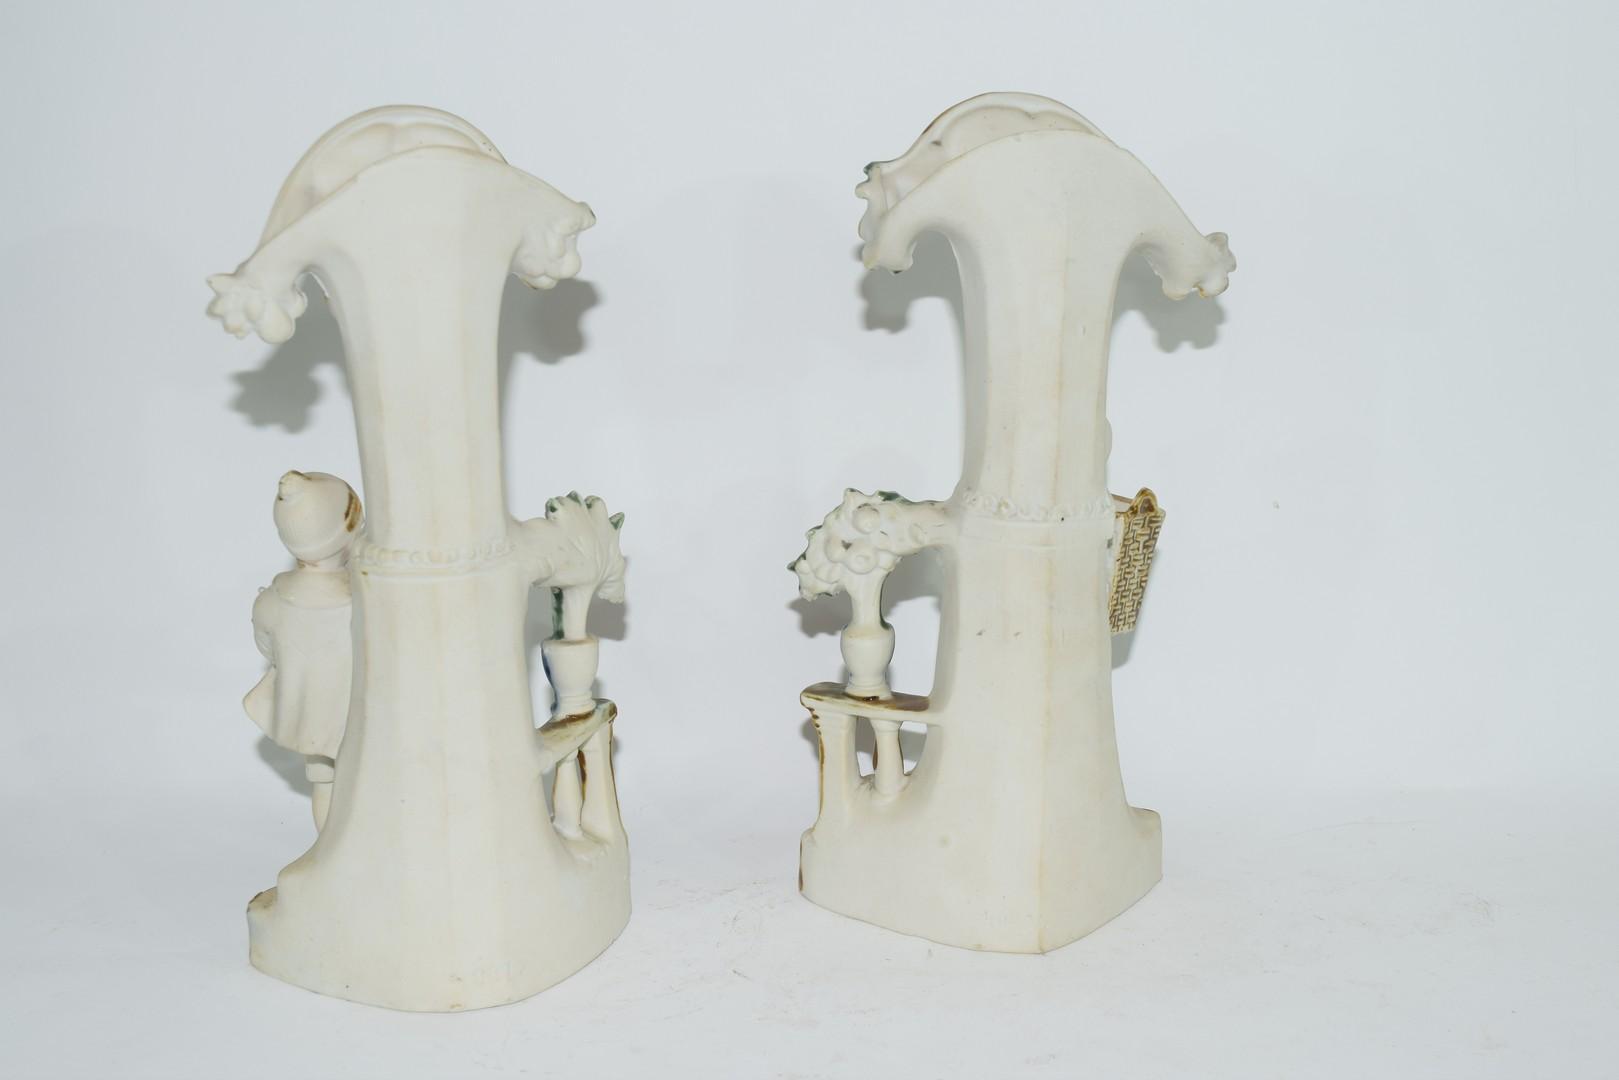 Pair of bisque porcelain spill holder vases - Image 3 of 4